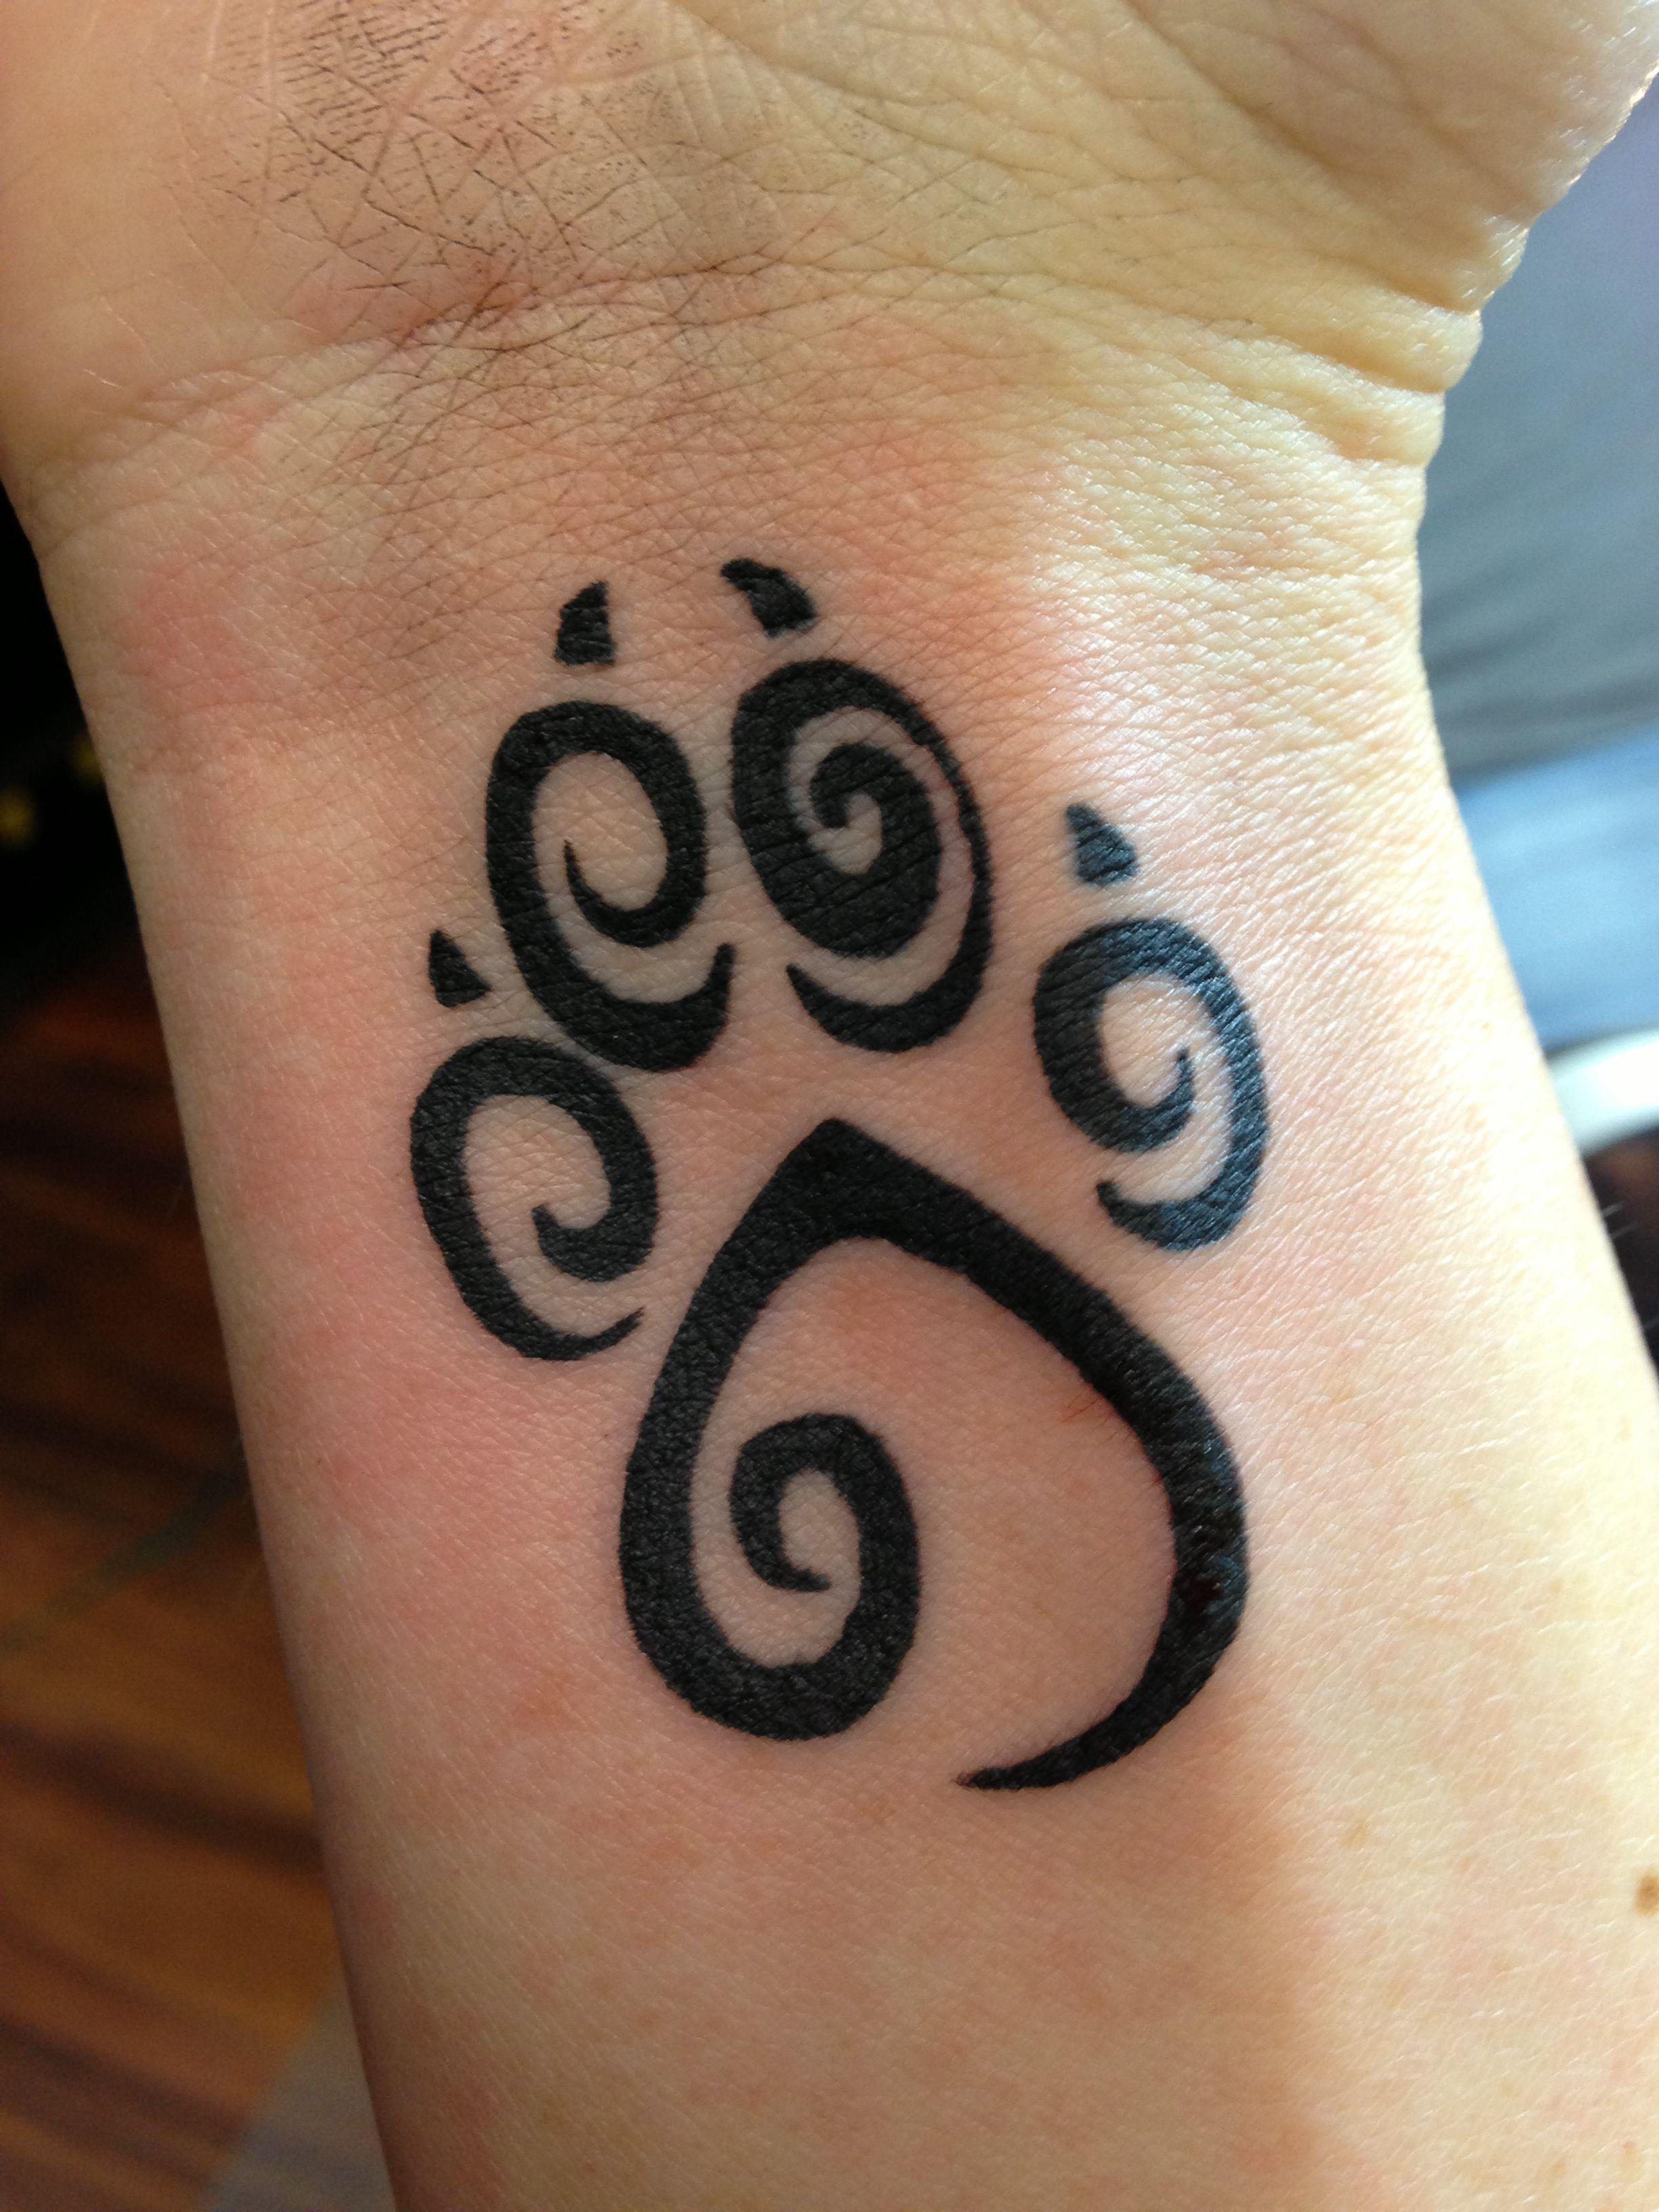 Paw Print Tattoo On Bottom Of Foot: Paw Print Tattoo For My Fur Babies.